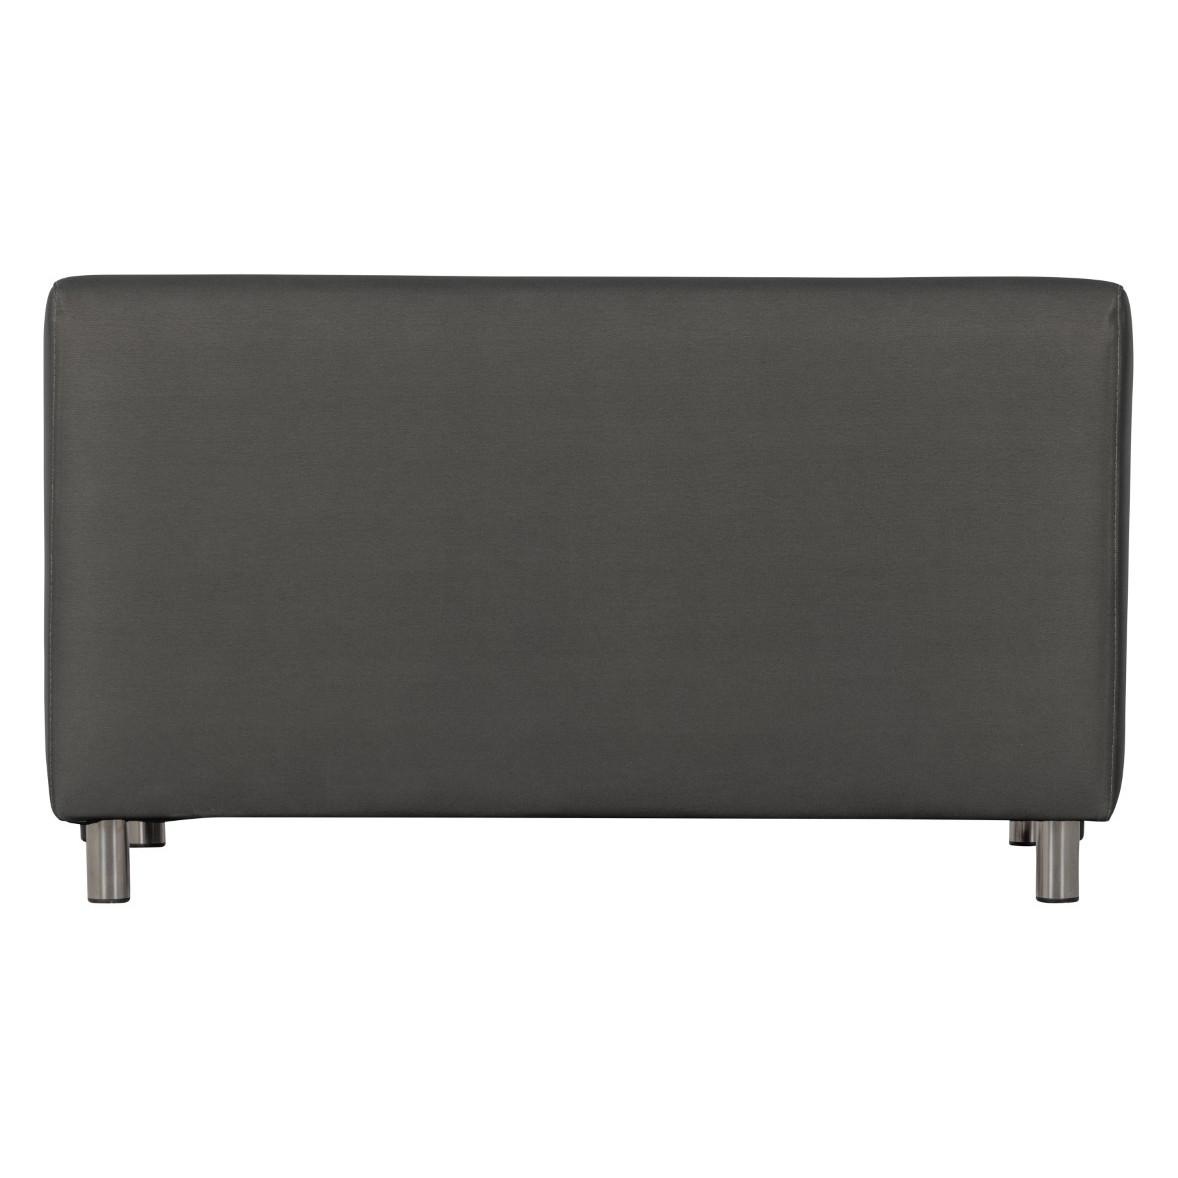 Outdoor 2 Seater Hollandia | Grey